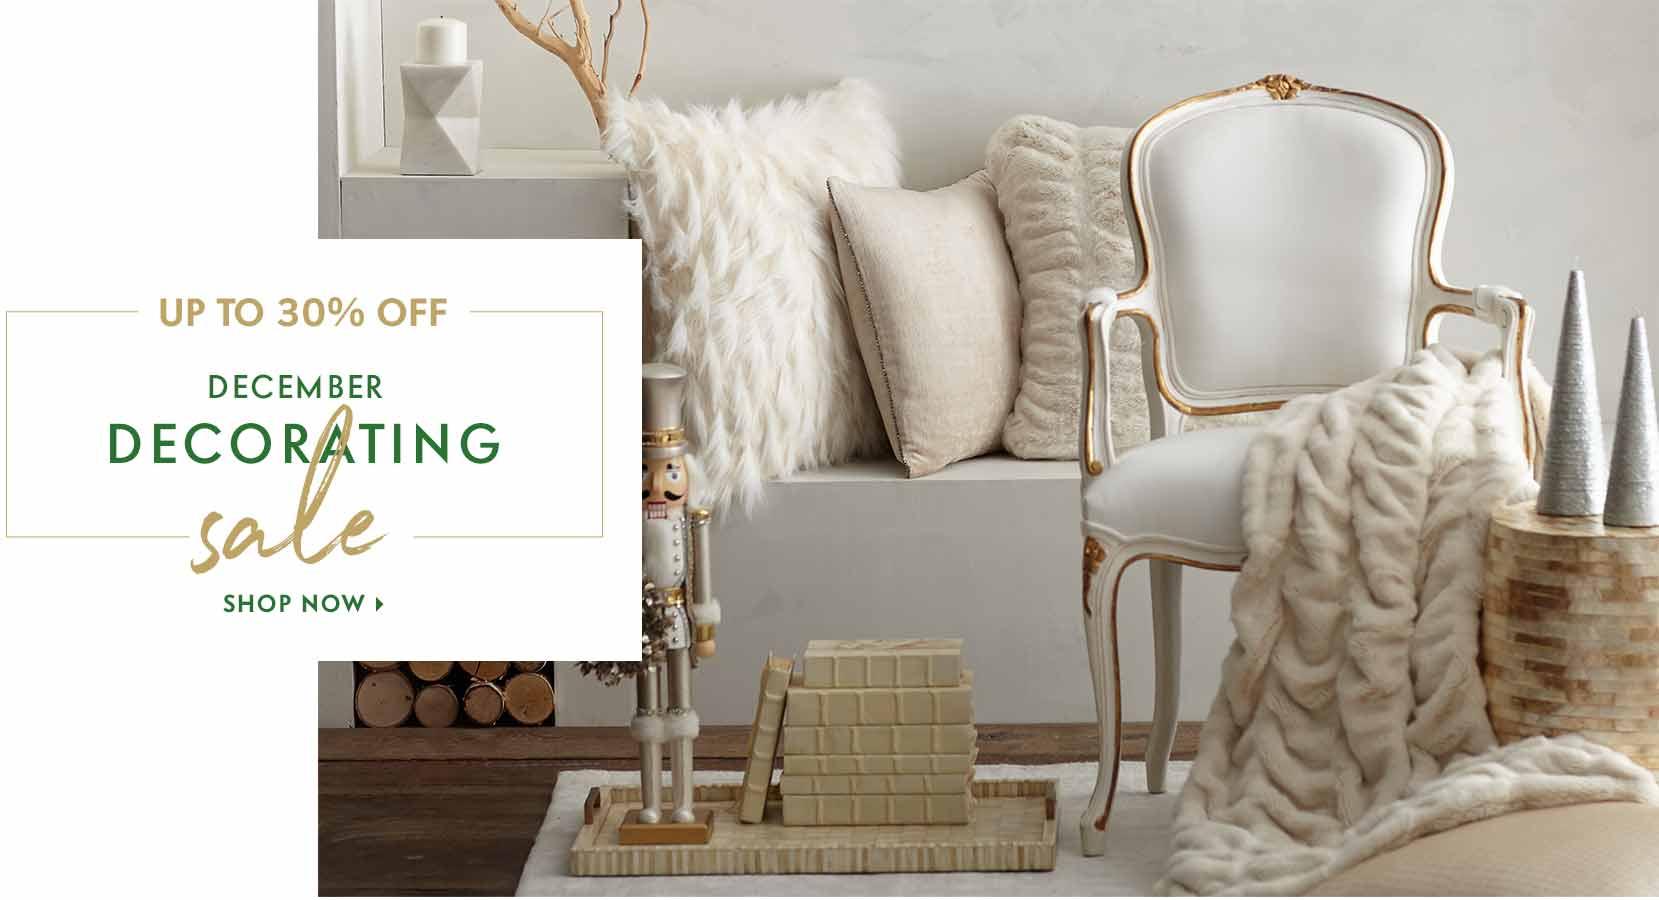 sale savings free shipping decor lighting holiday decor curtains rugs